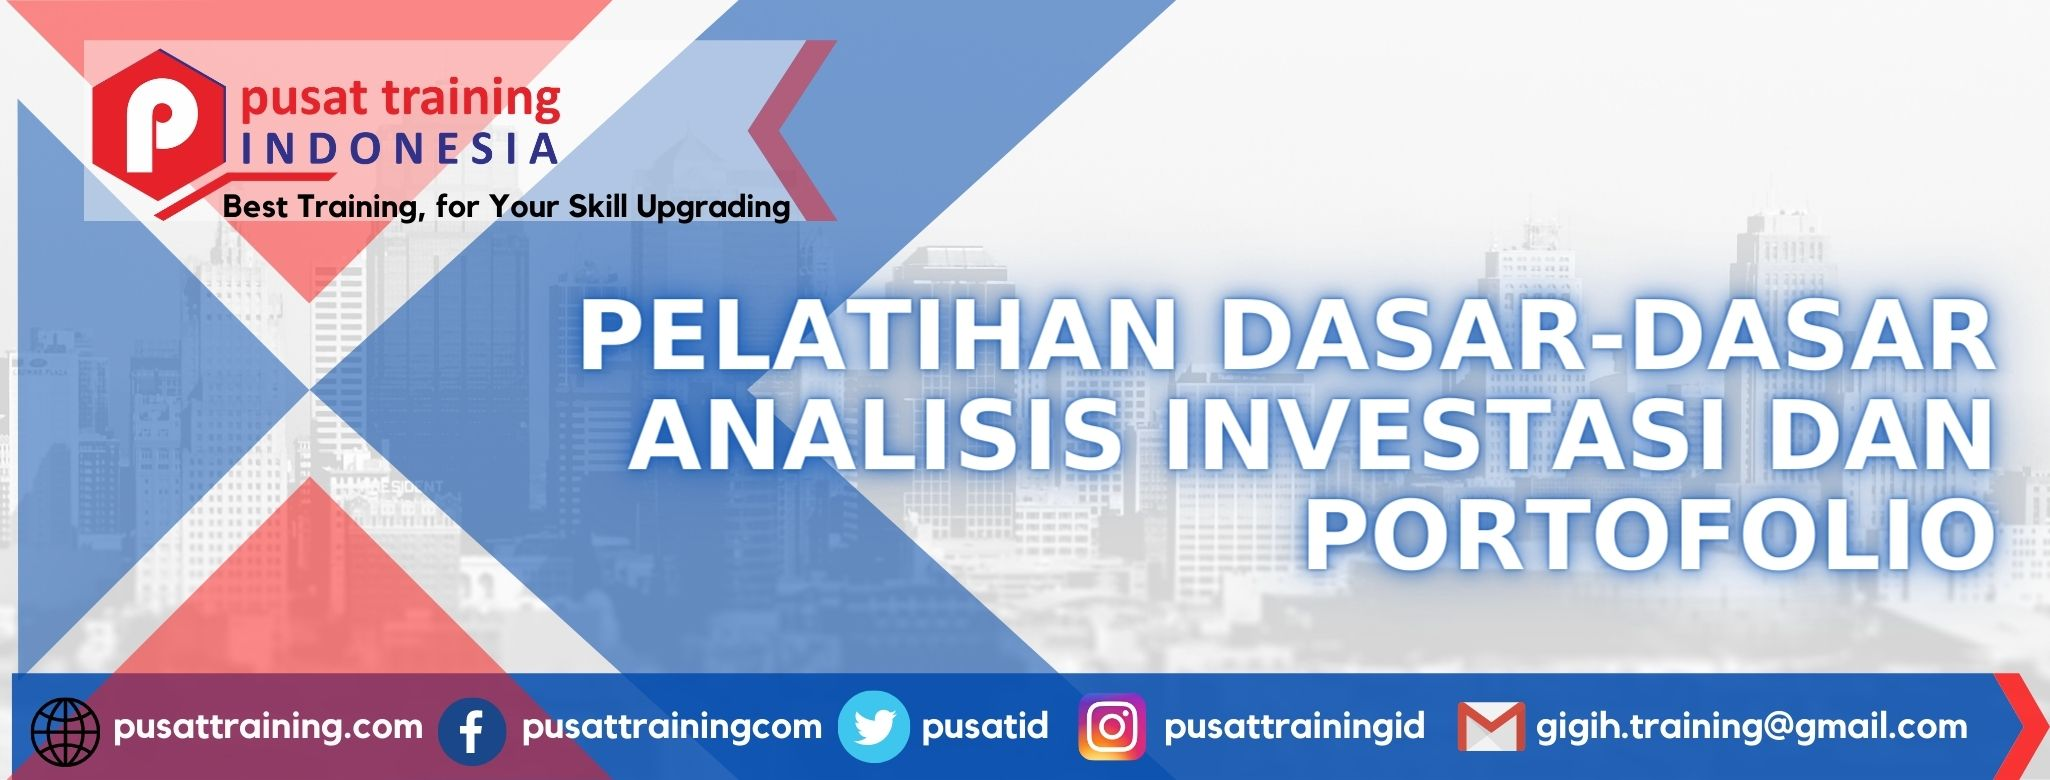 pelatihan-dasar-analisis-investasi-dan-portofolio